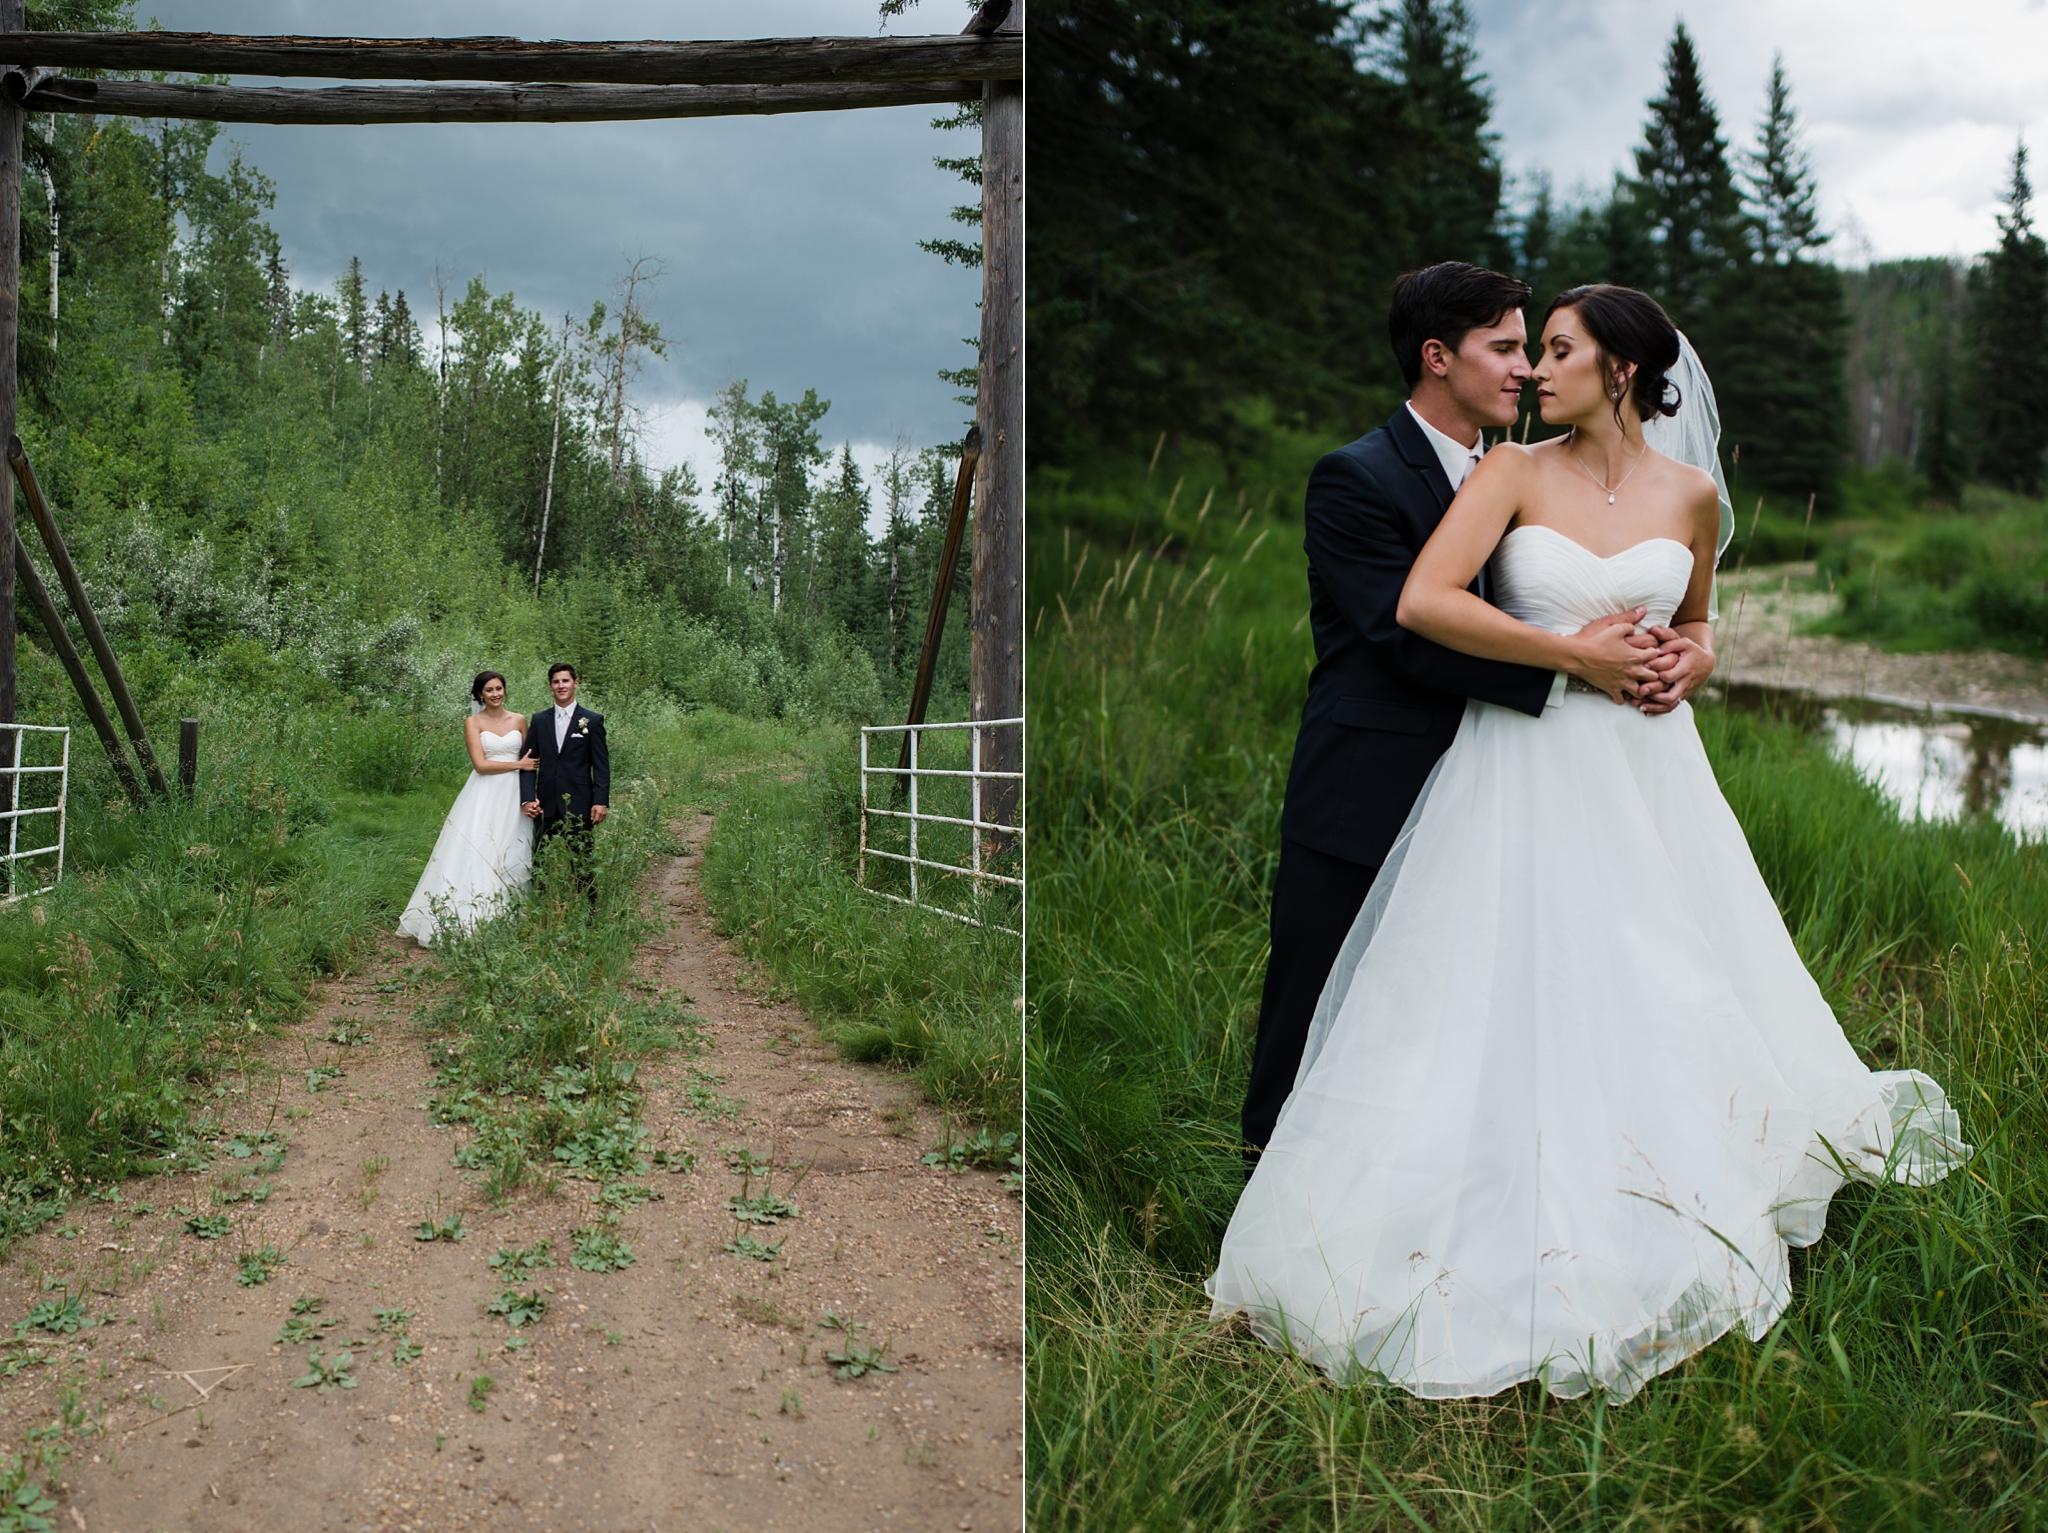 kaihla_tonai_intimate_wedding_elopement_photographer_0098